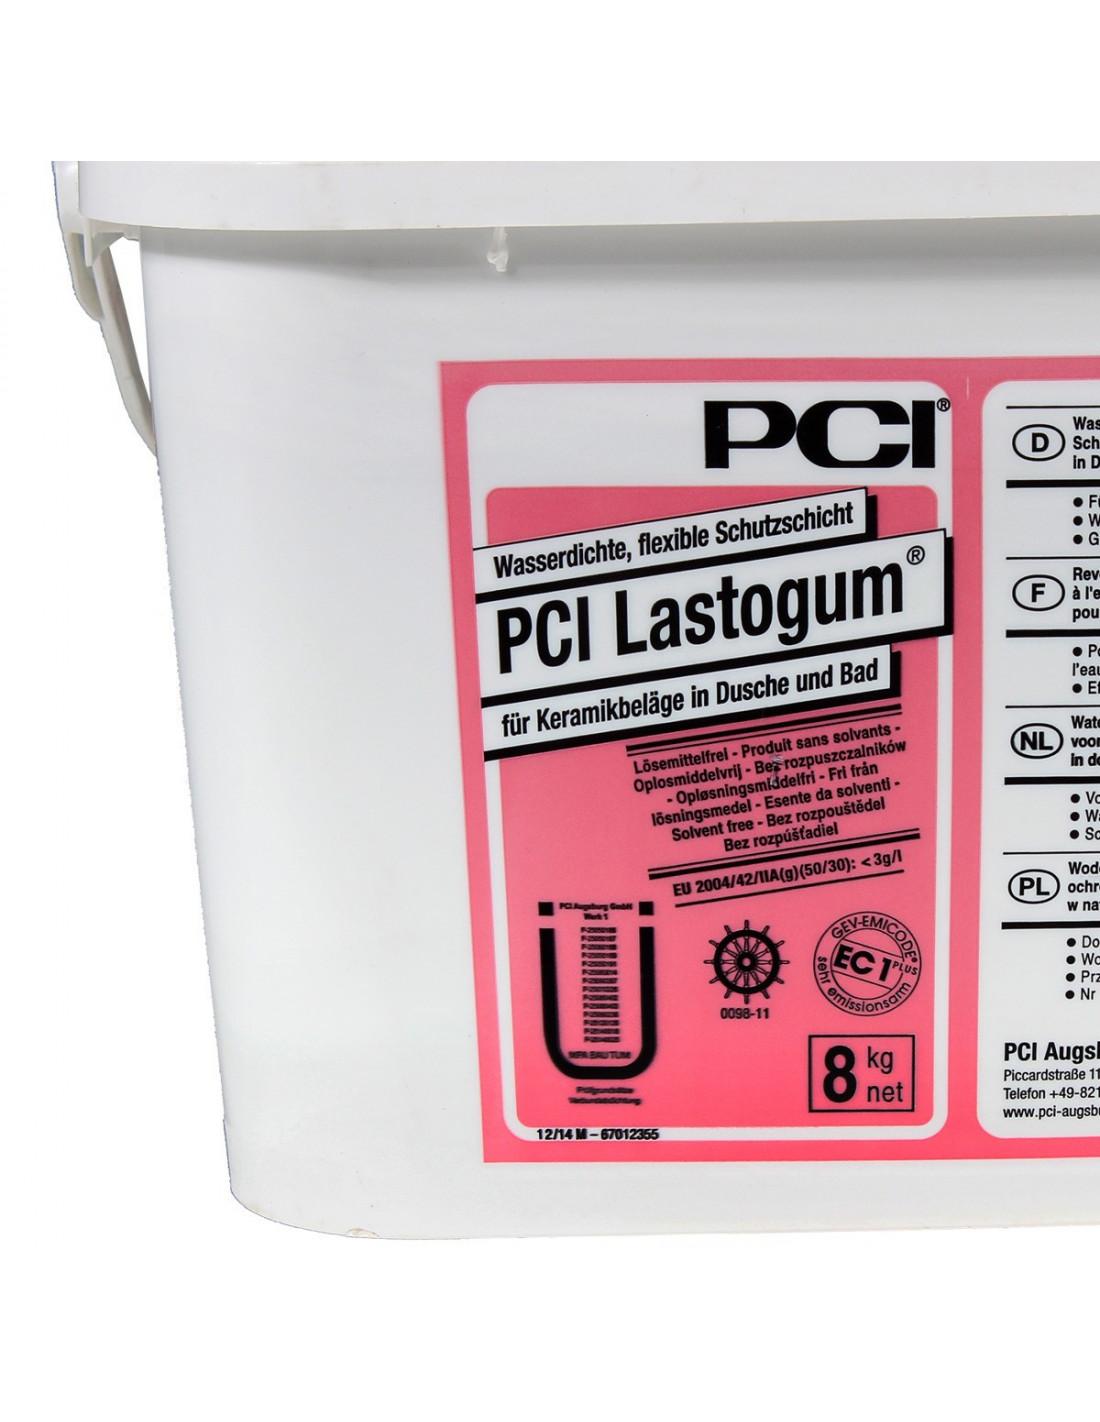 Lastogum Pci Pci Pecitape Technotrade Associates With Lastogum Pci